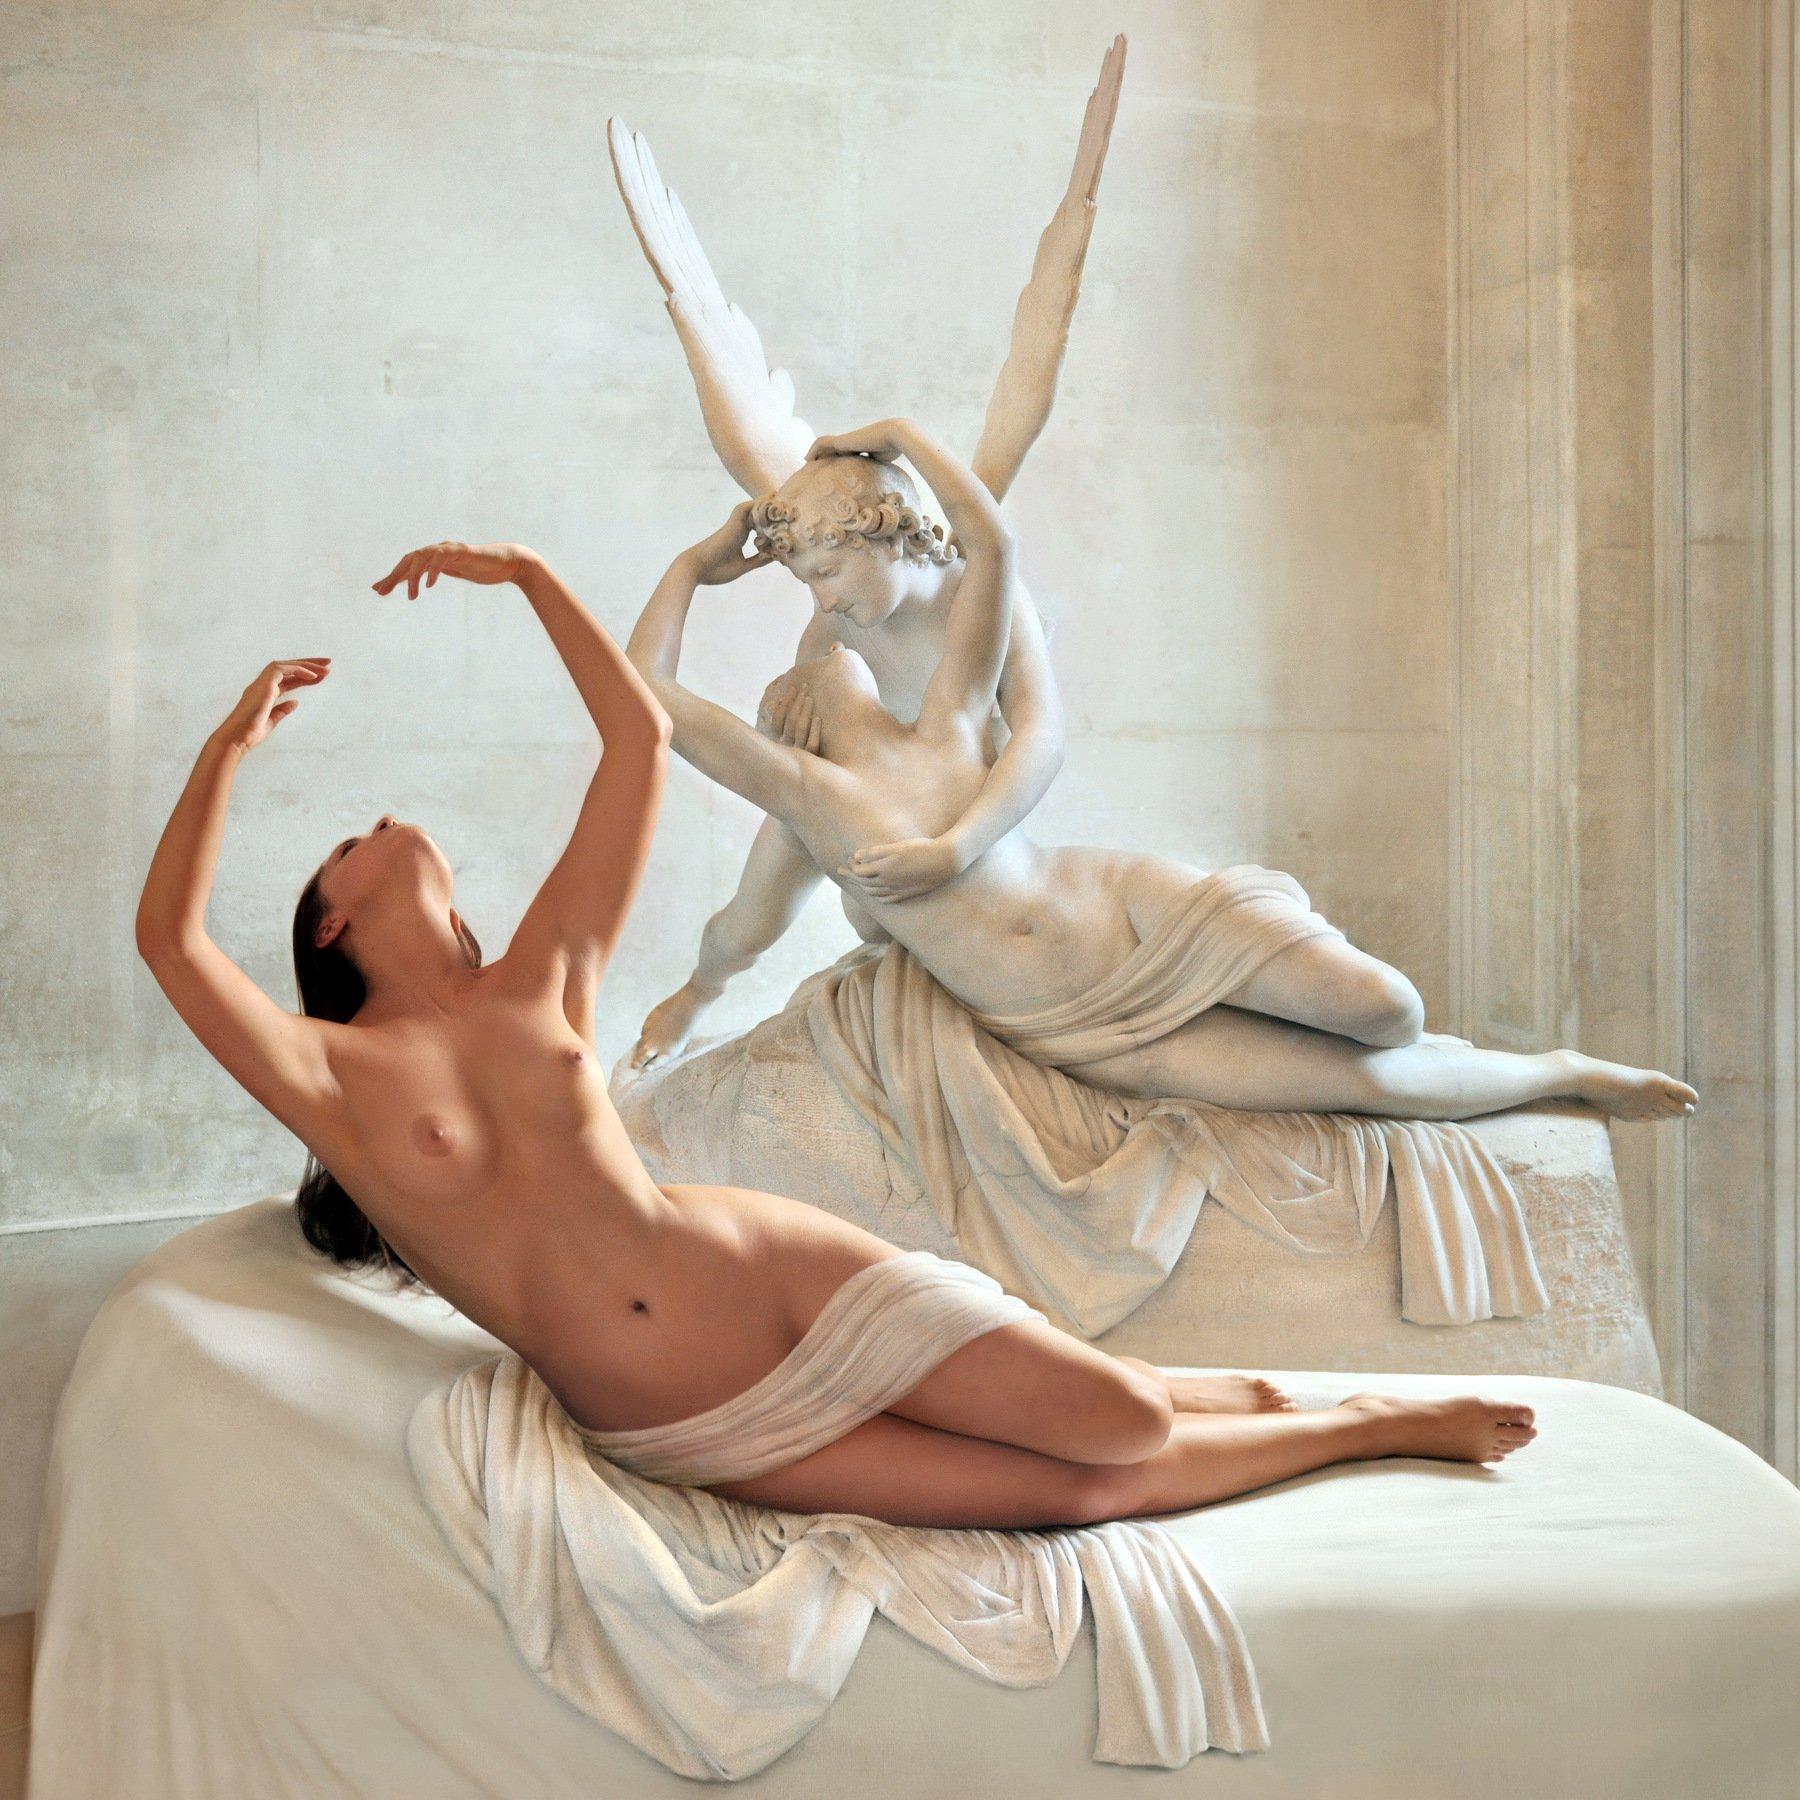 sculpture, art, museum, marble, stone, sleep, love, girl, nude, model, posing, paris, louvre, myth, greek, Endegor